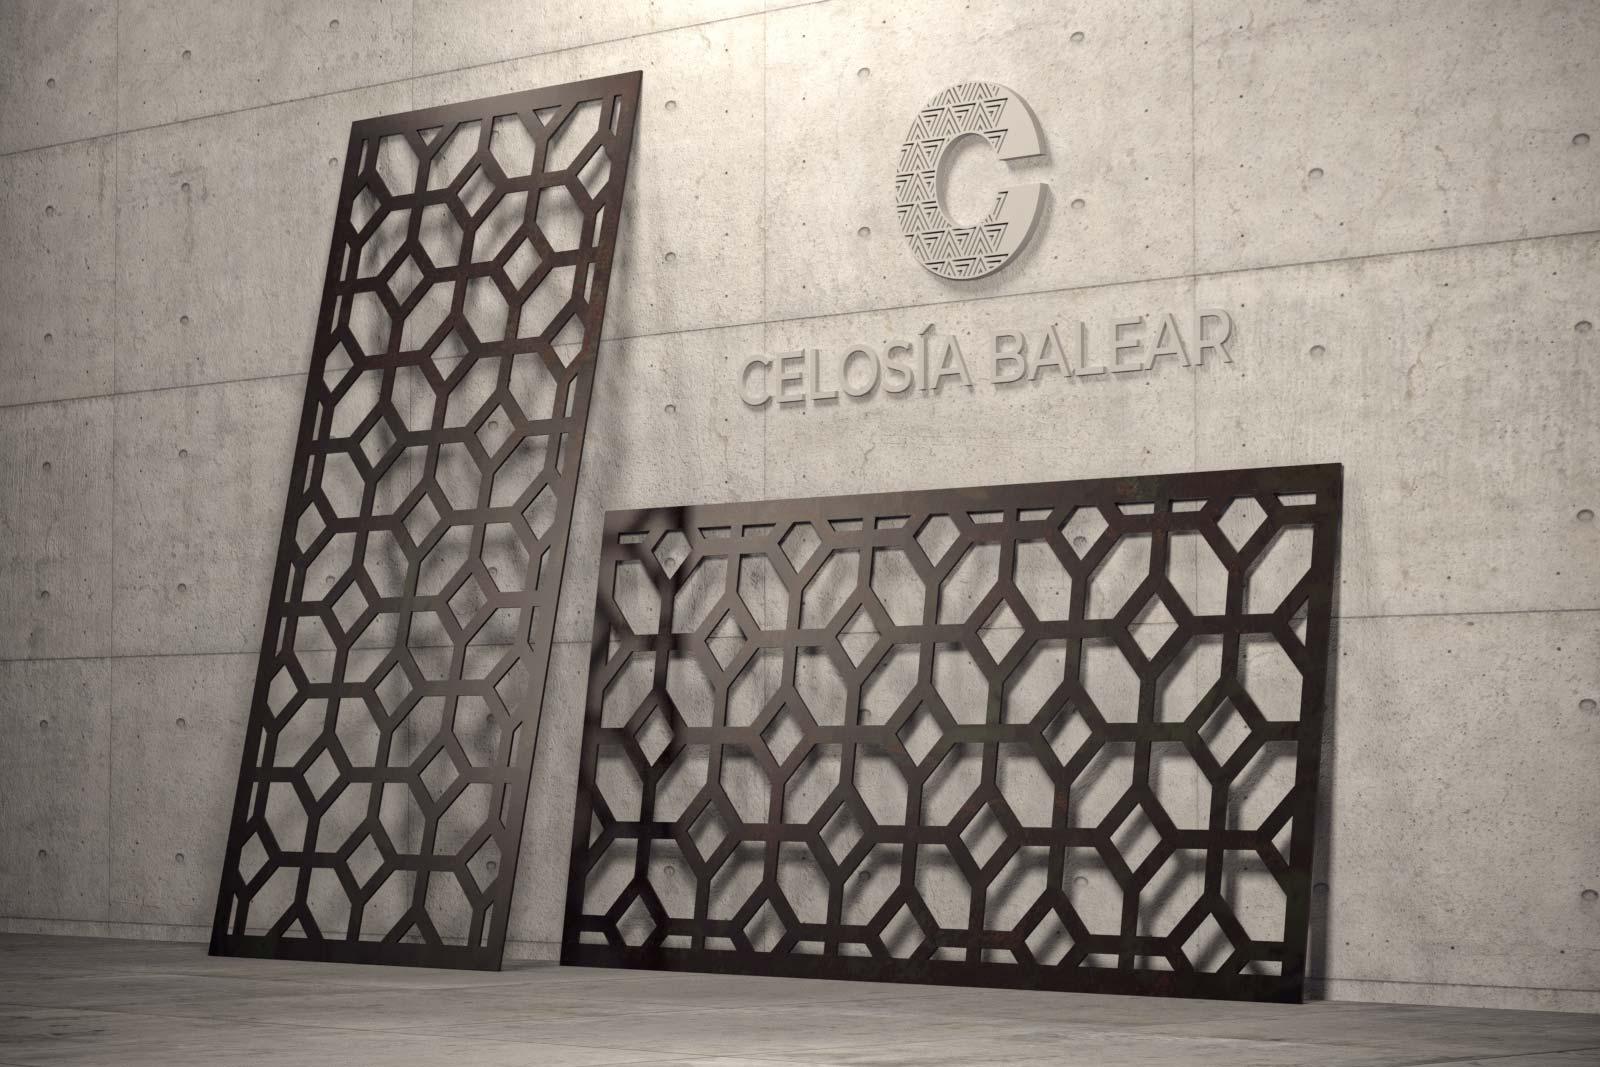 placa de celosía mallorquina con diseño cubista